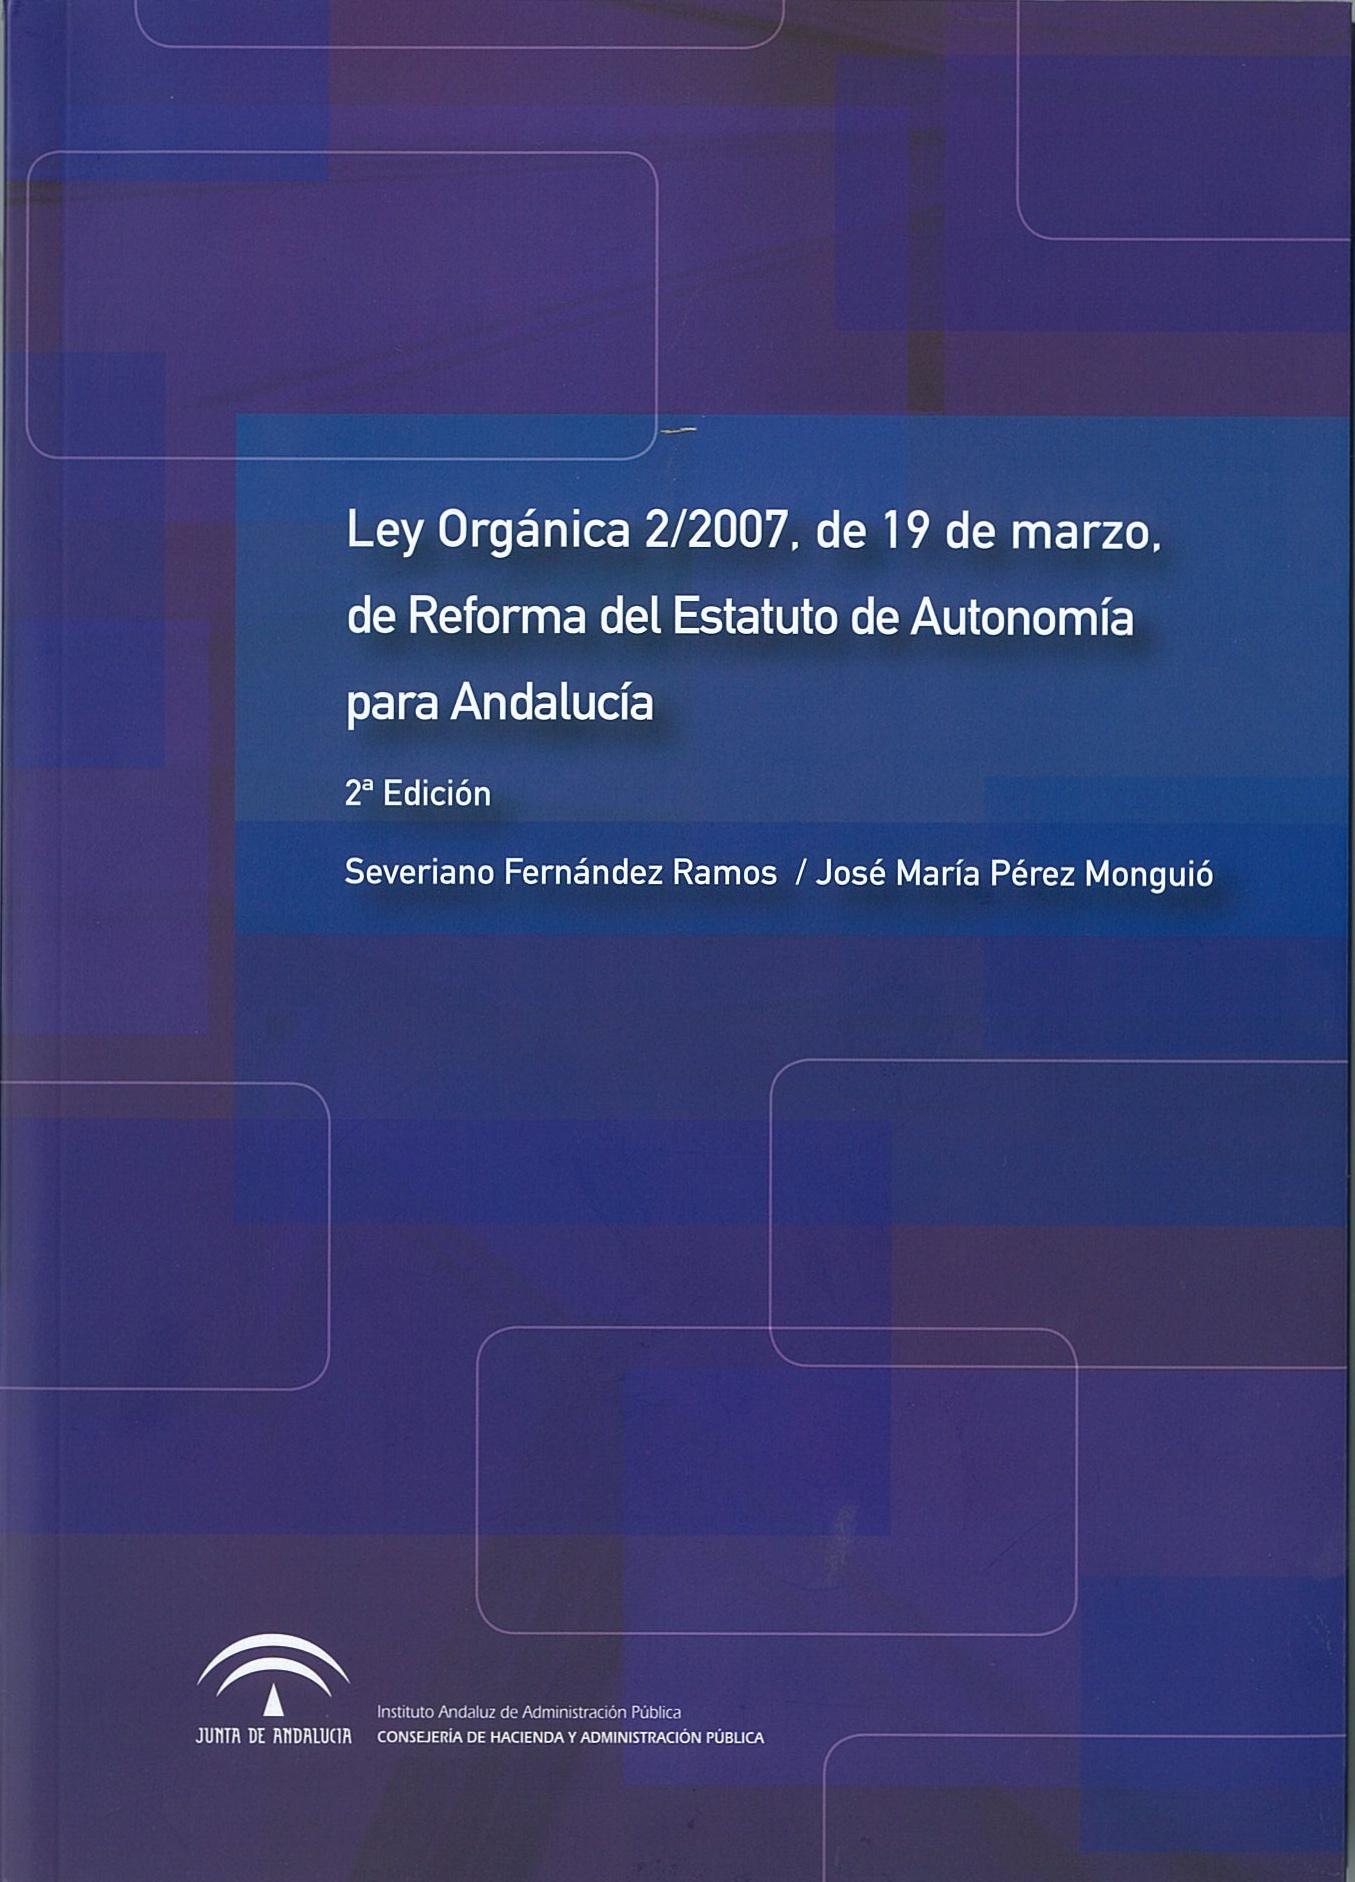 LEY ORG�NICA 2/2007, DE 19 DE MARZO, DE REFORMA DEL ESTATUTO DE AUTONOM�A PARA ANDALUC�A (2� Edici�n)